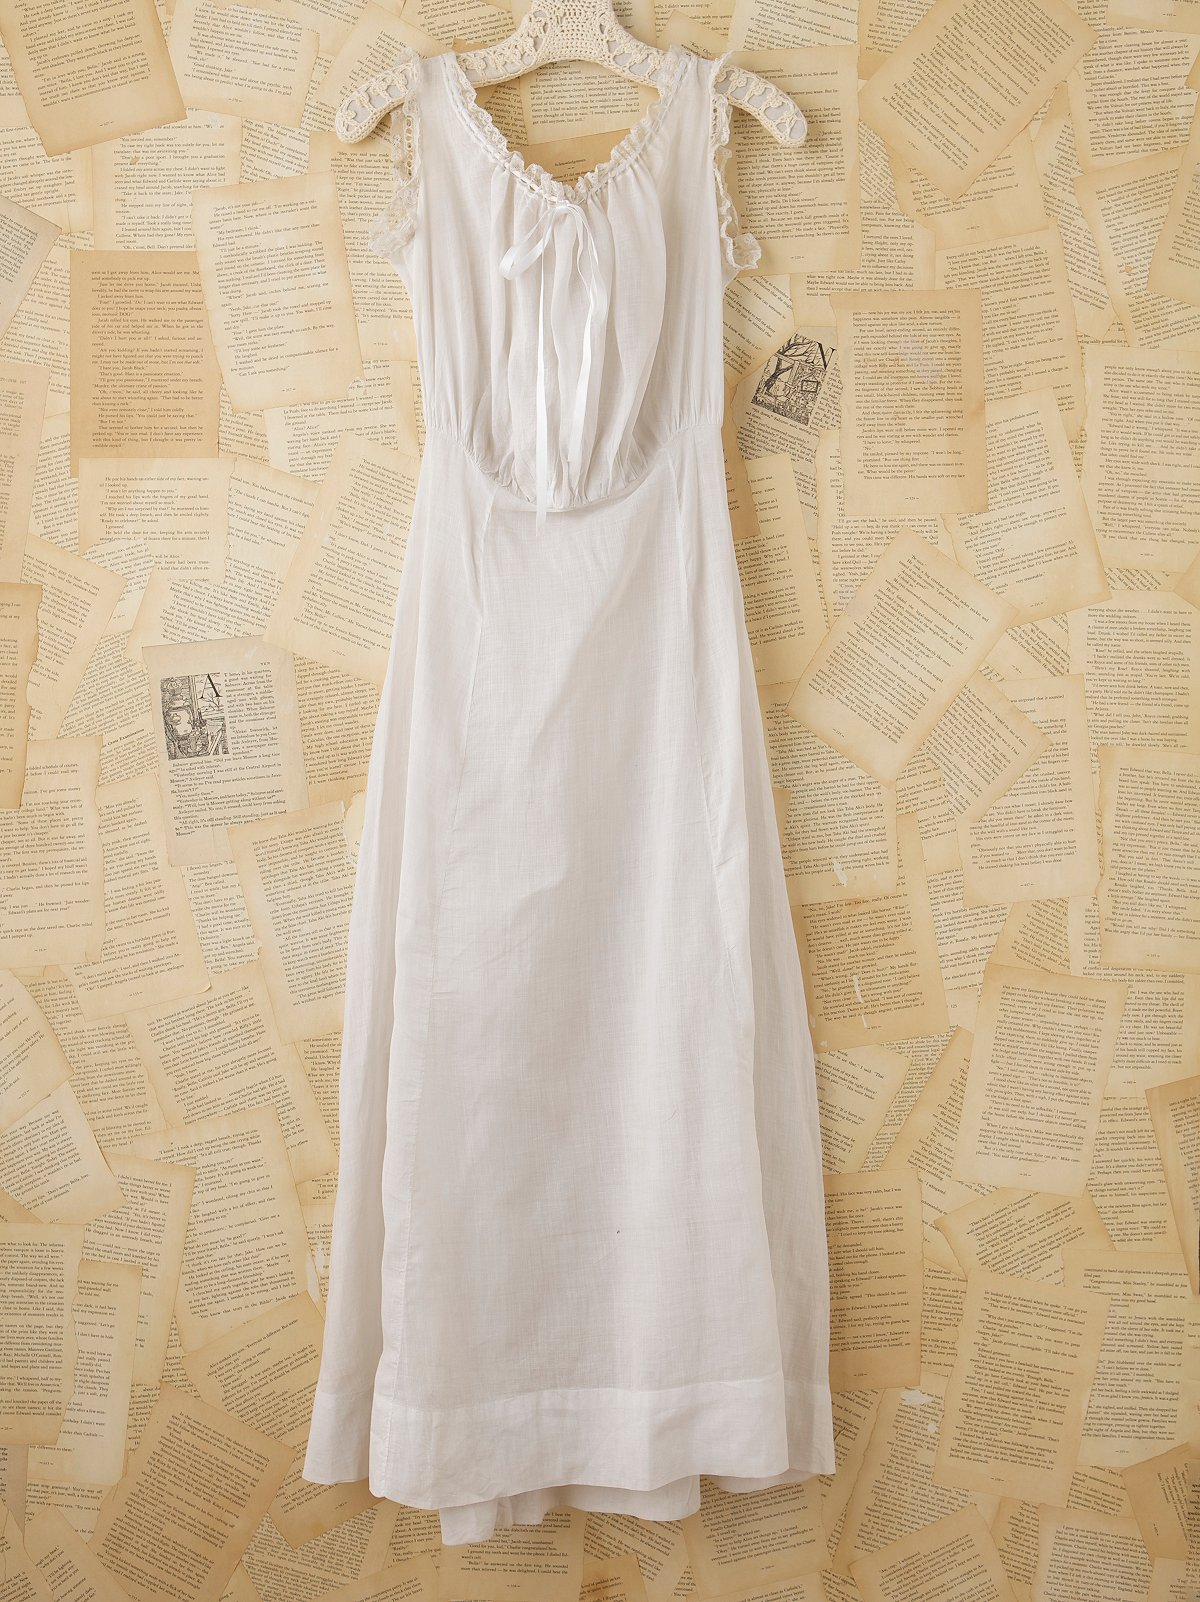 Vintage Victorian Dress